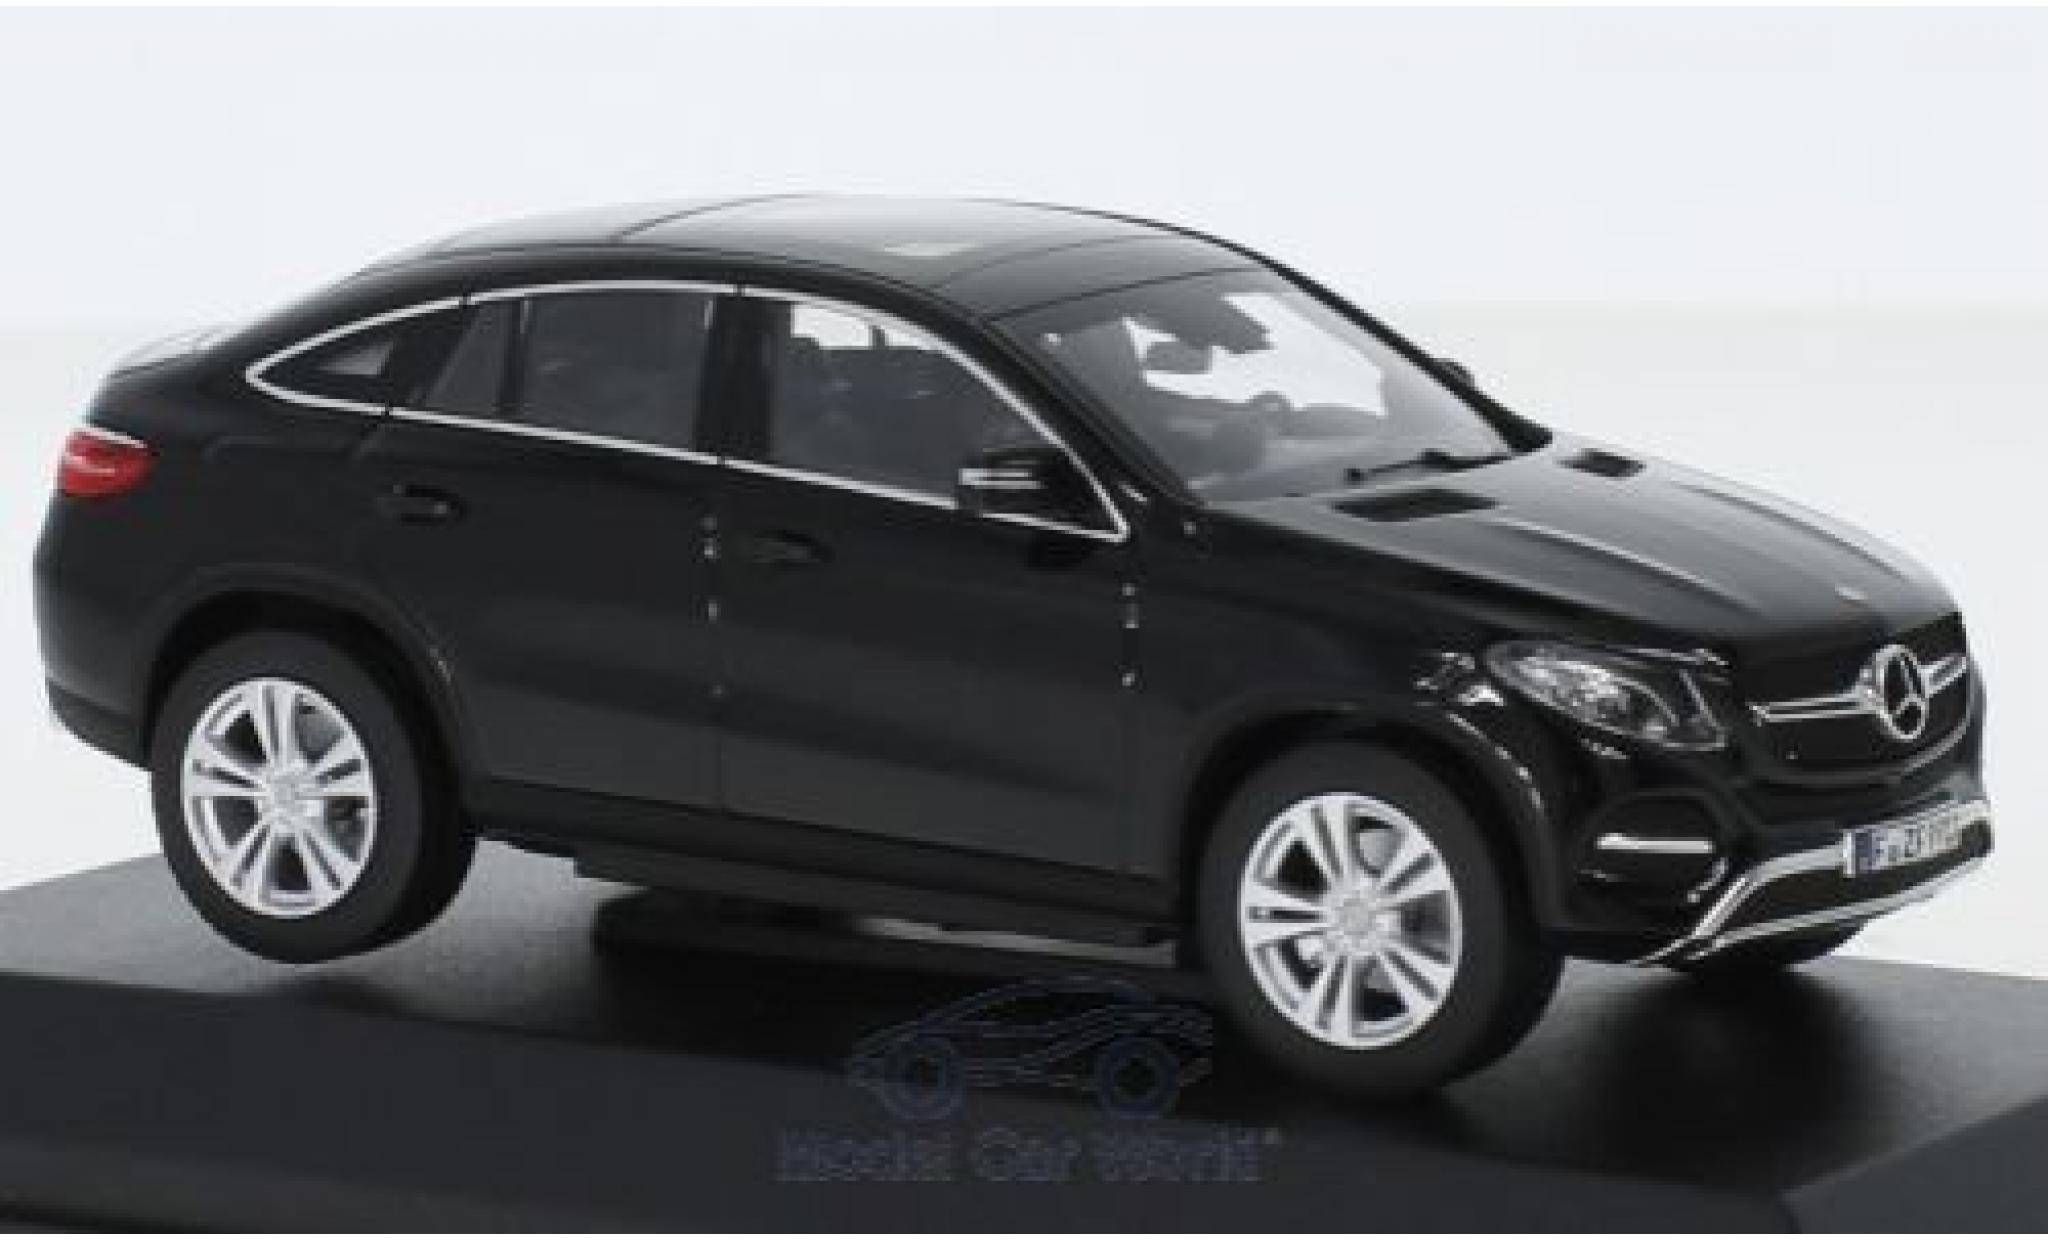 Mercedes Classe GLE 1/43 Norev GLE Coupe noire 2015